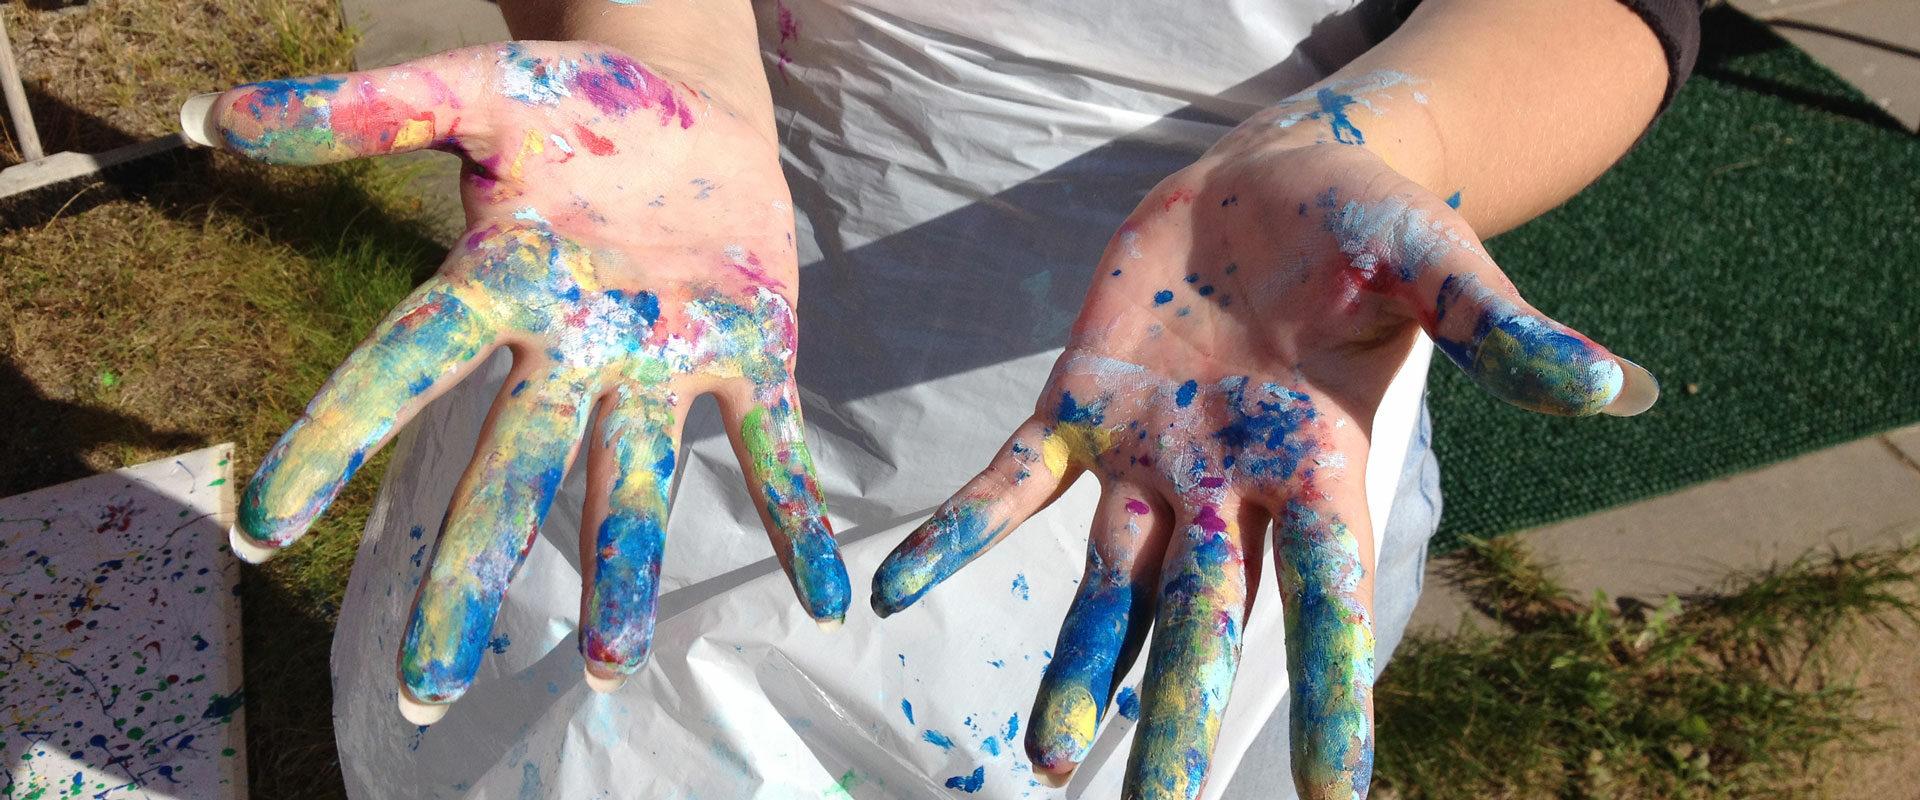 Geijerskolan - Kreativitet